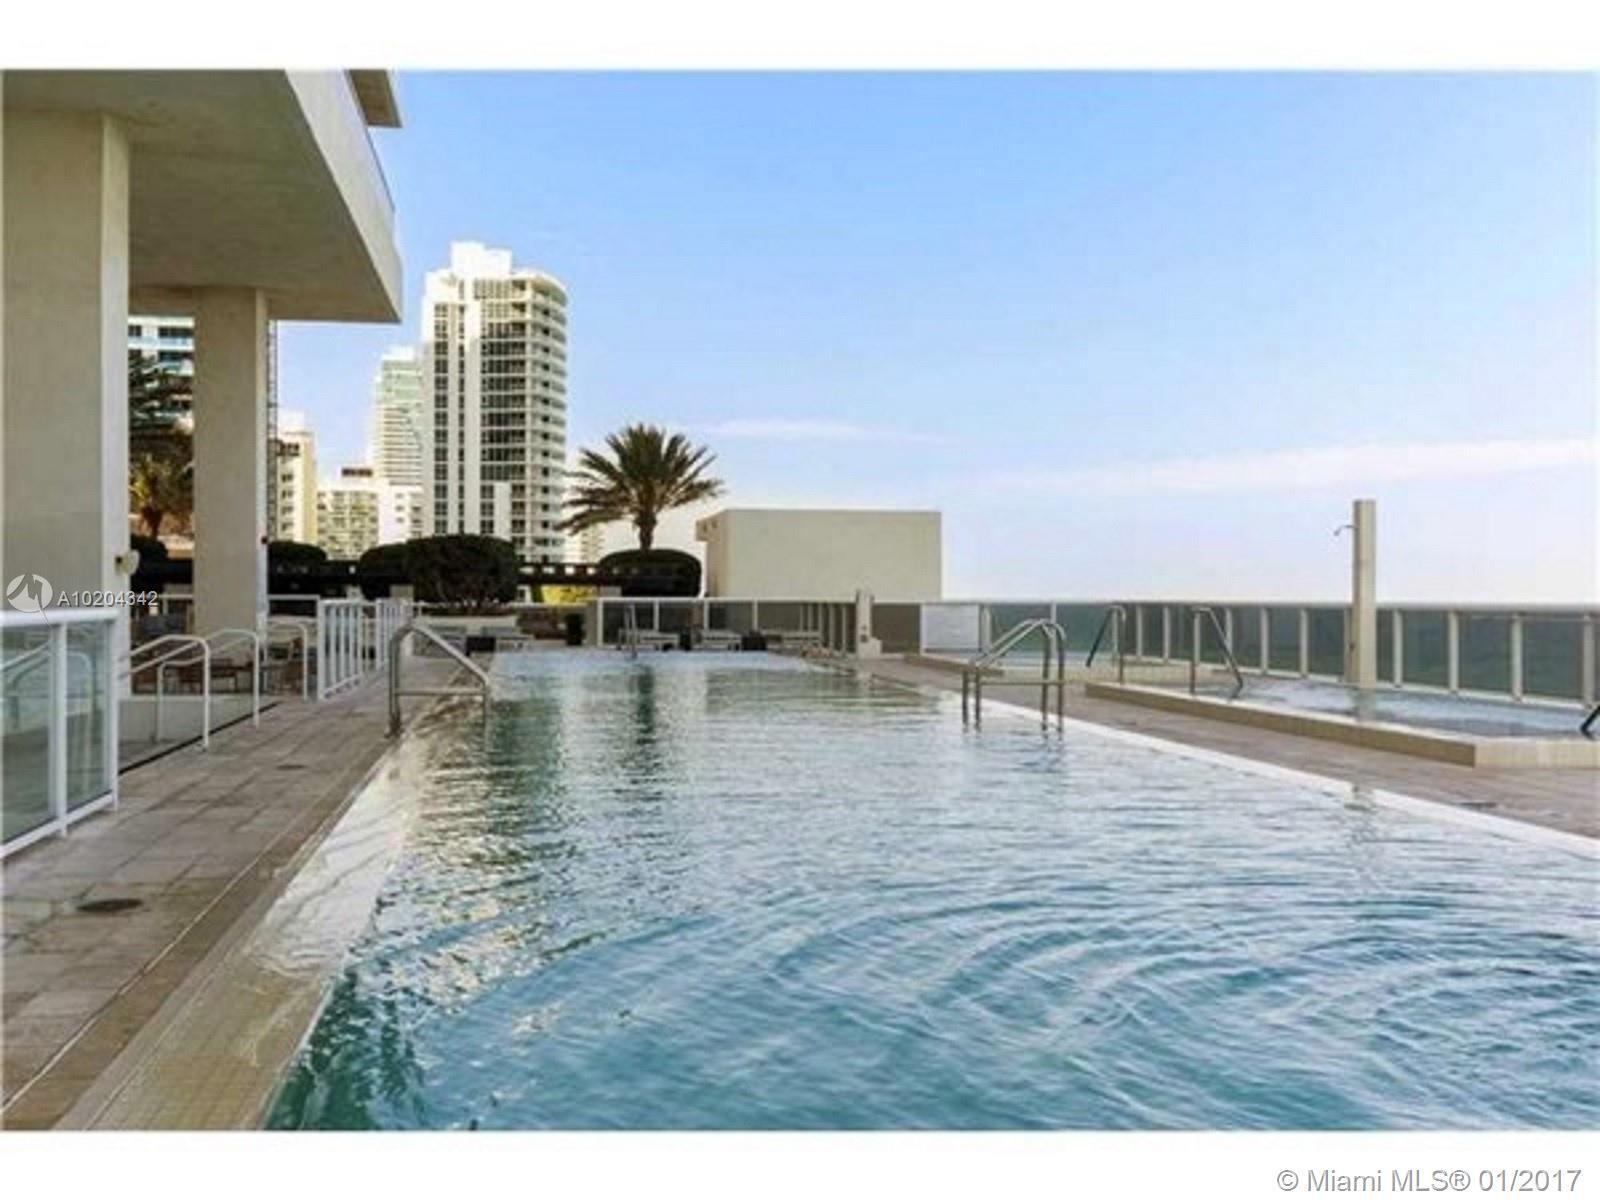 Beach Club Towers #UPH08 - 21 - photo